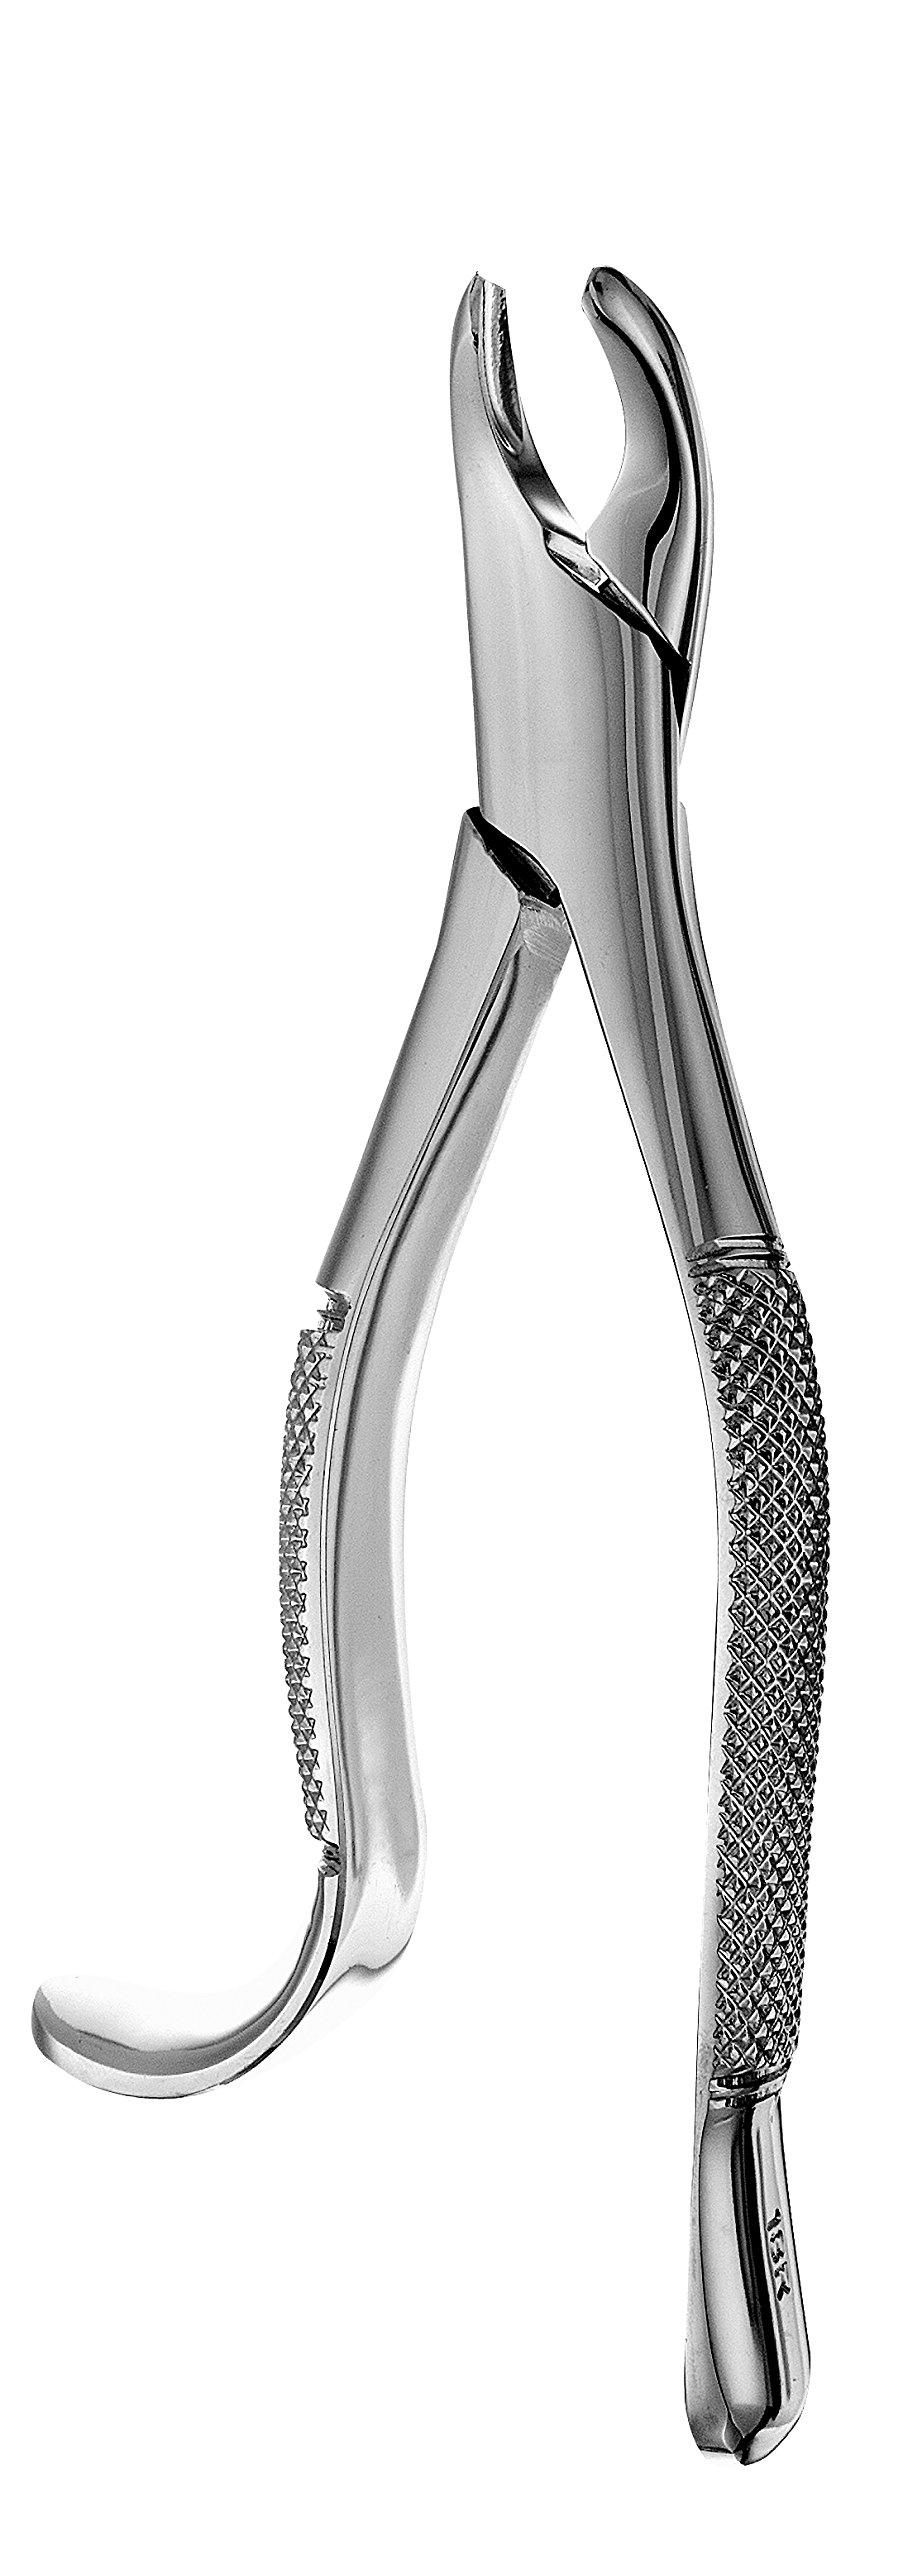 Hu-Friedy F23 #23 Forceps